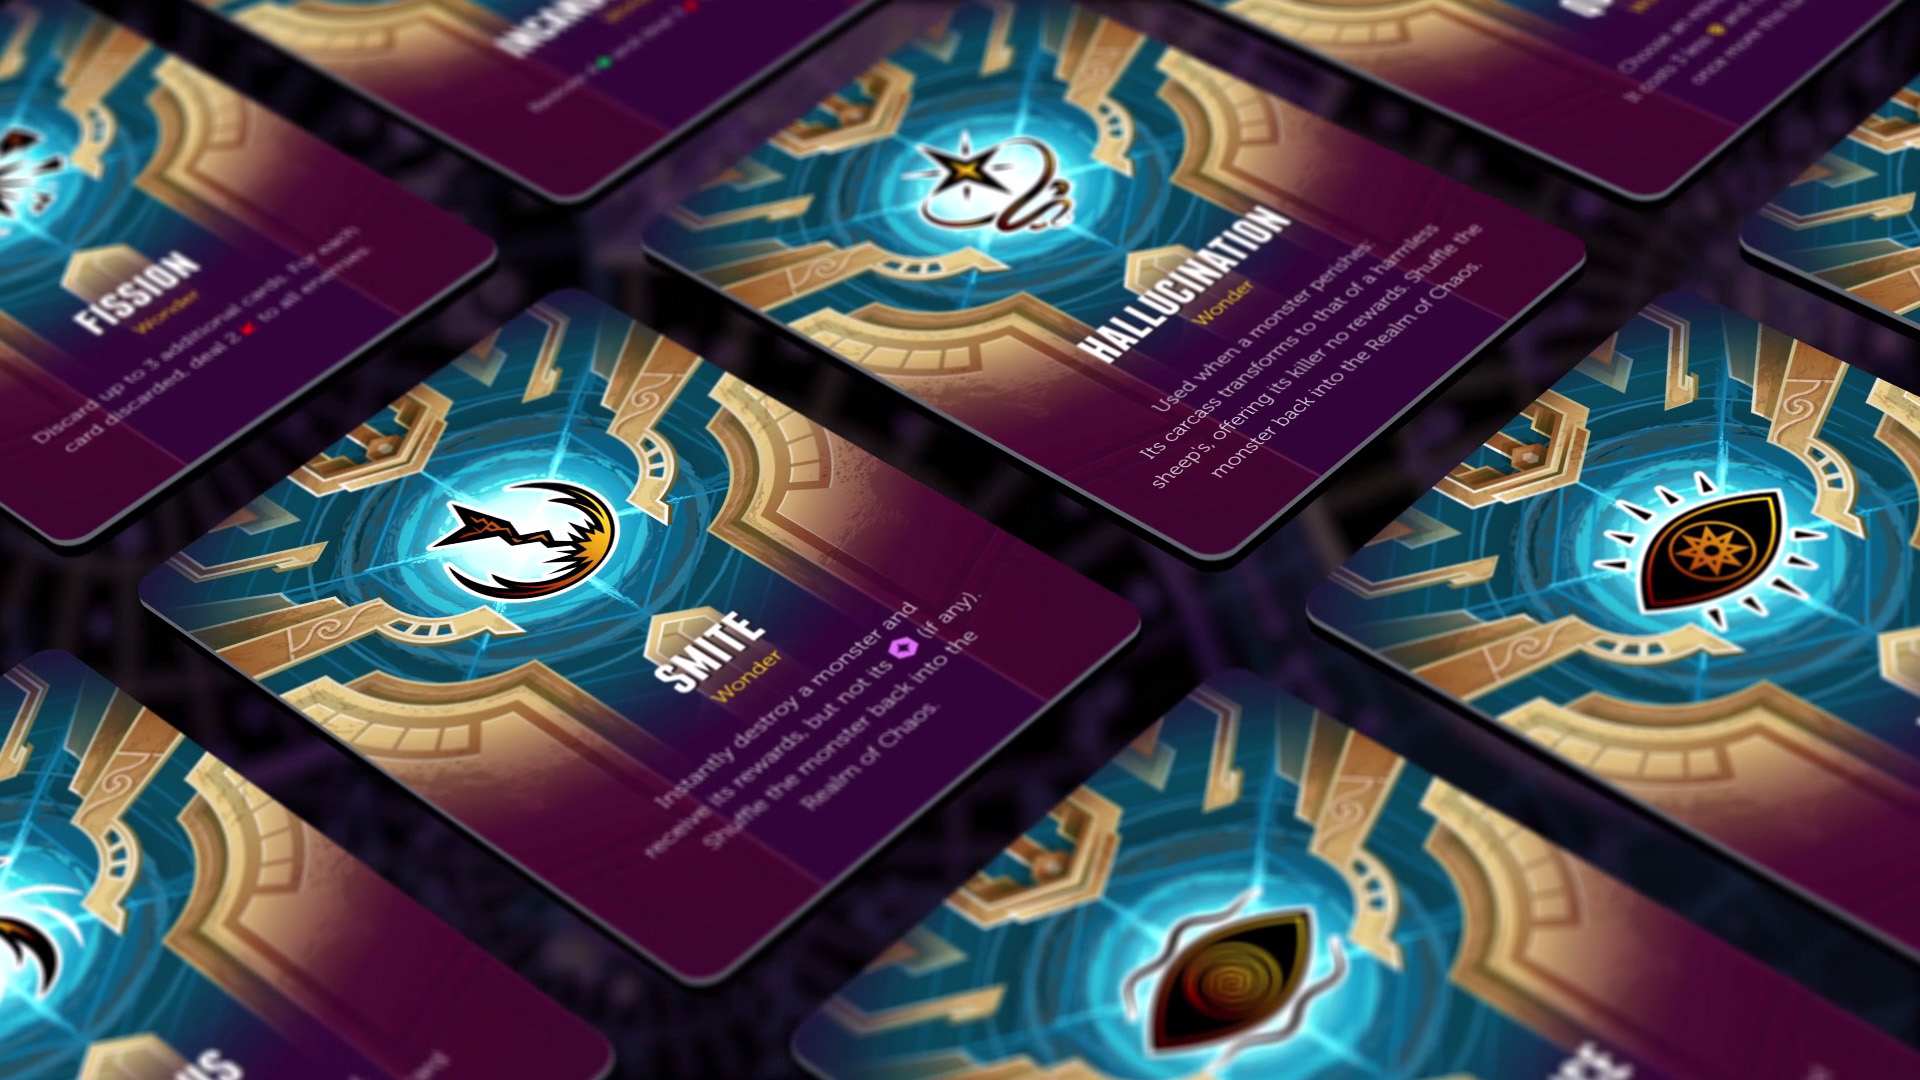 Endogenesis cards 1